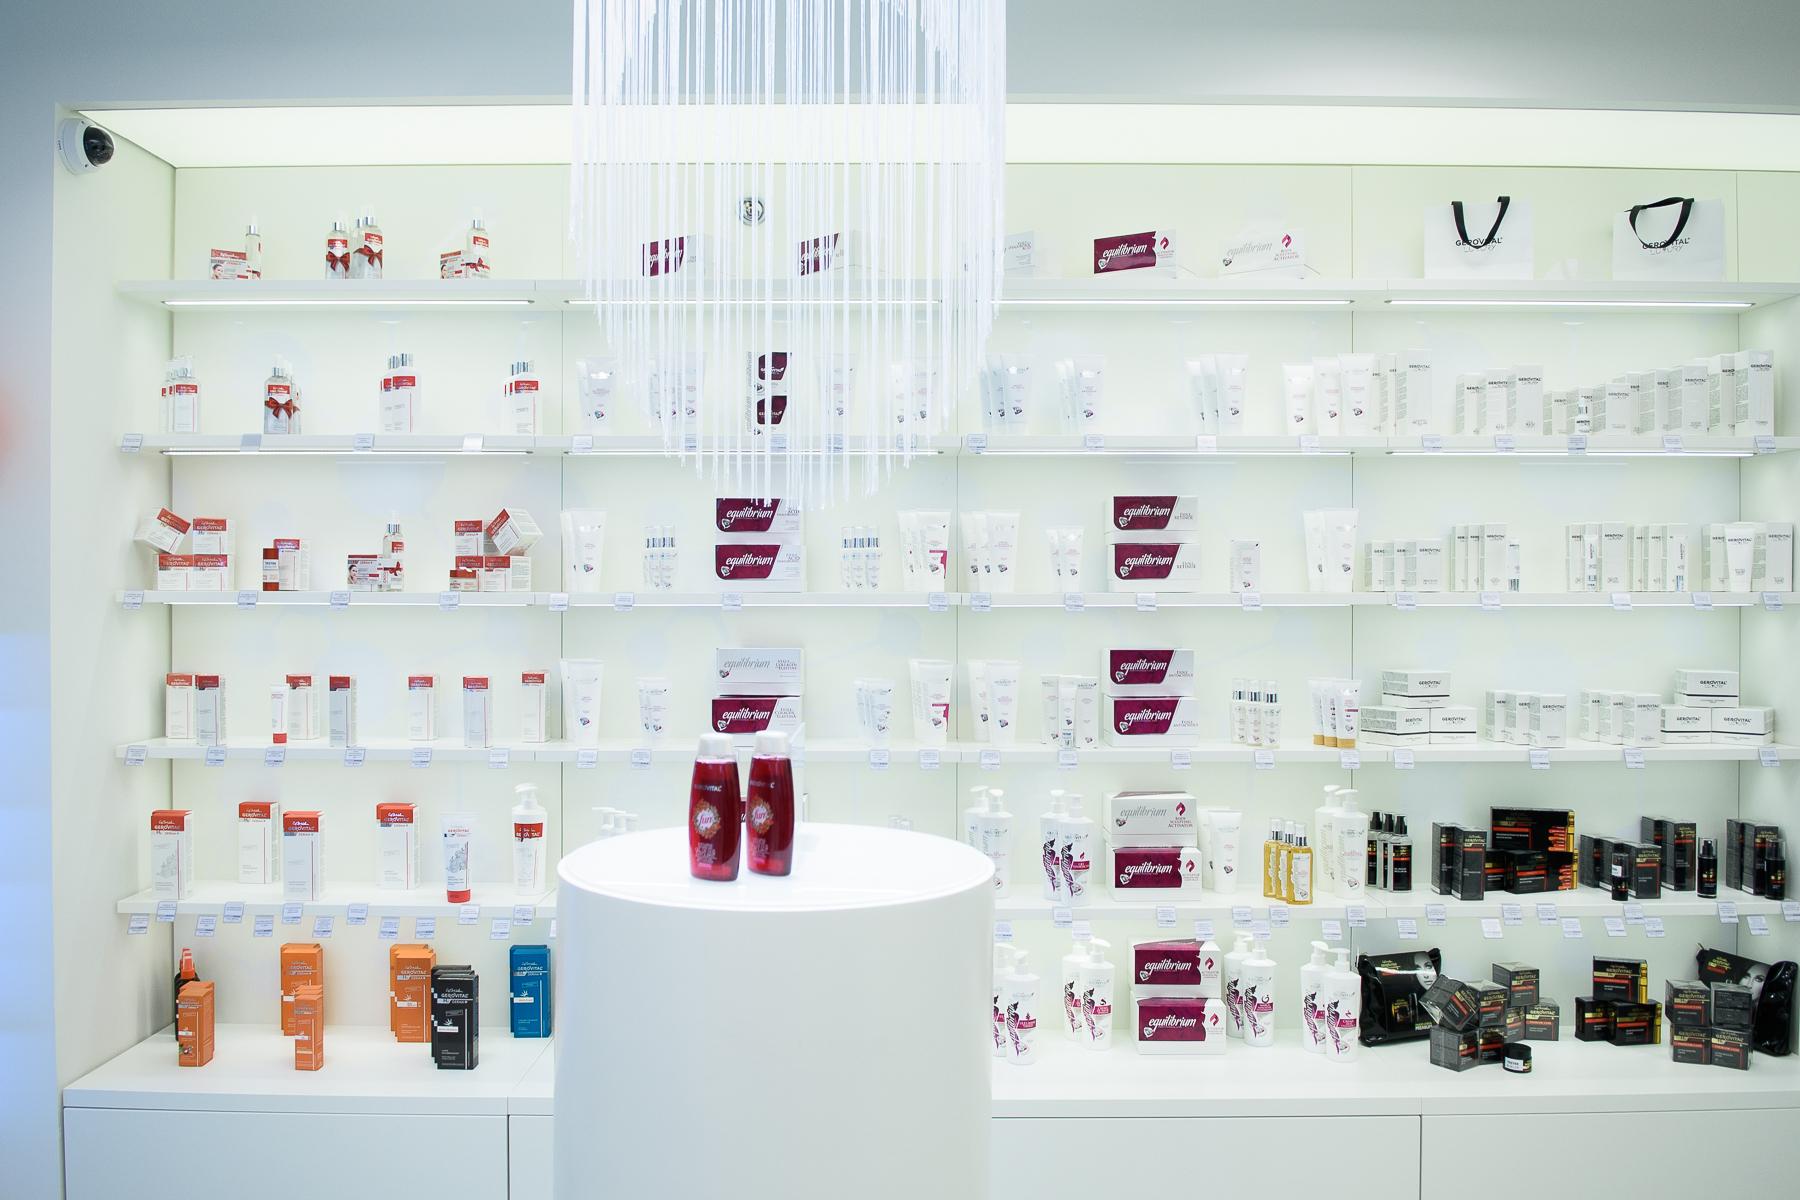 Farmec deschide in Pitesti cel de-al doilea magazin Gerovital in sistem de franciza, in urma unei investitii de 50.000 euro